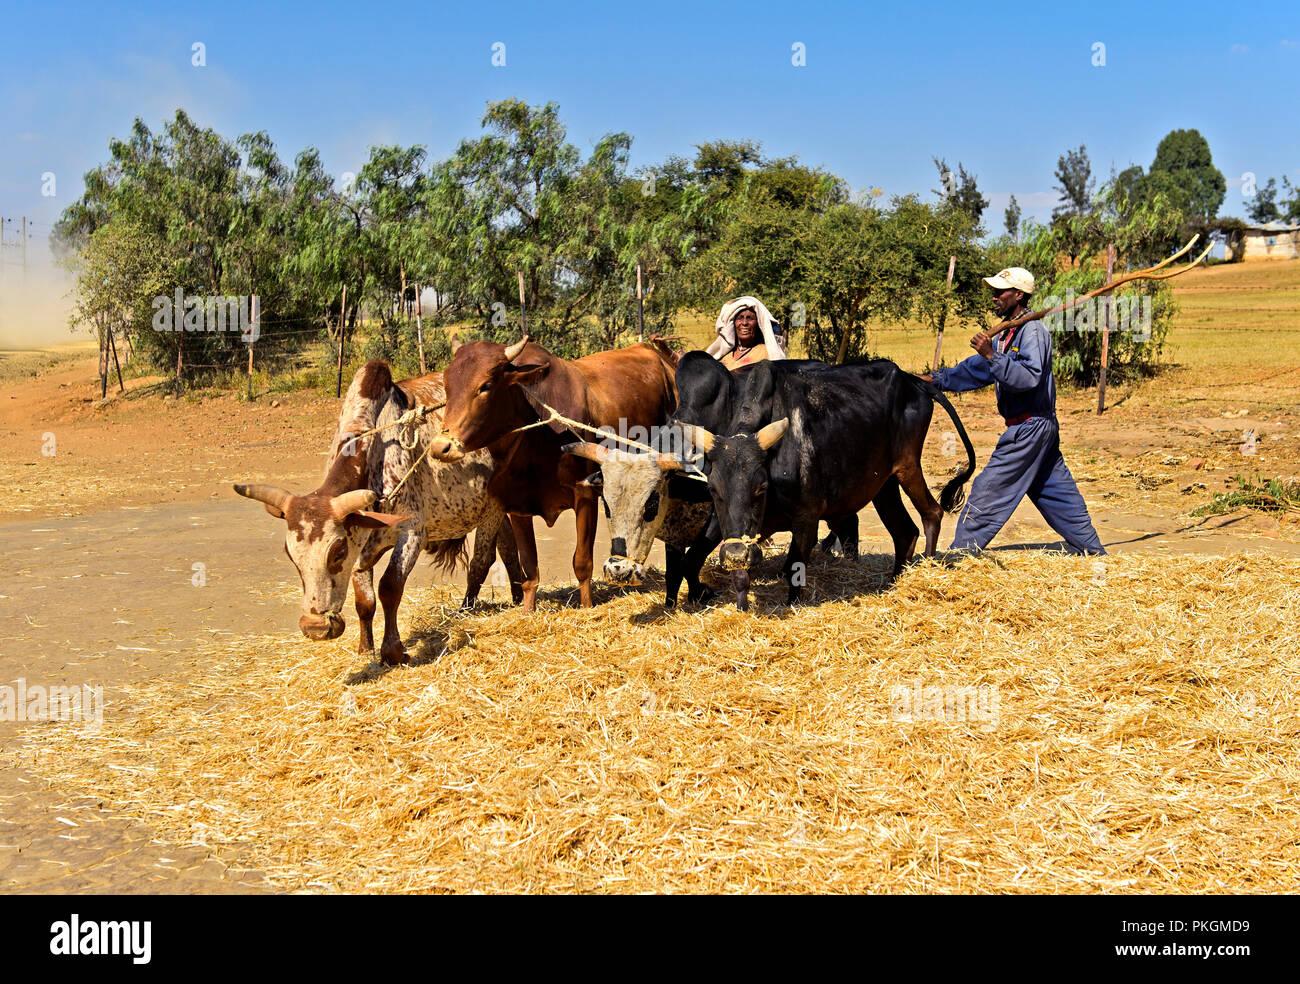 Traditional threshing of Teff (Eragrostis tef) by making Zebu cattle walk in circles on the grain, Hawzien Plateau, Tigray, Ethiopia - Stock Image